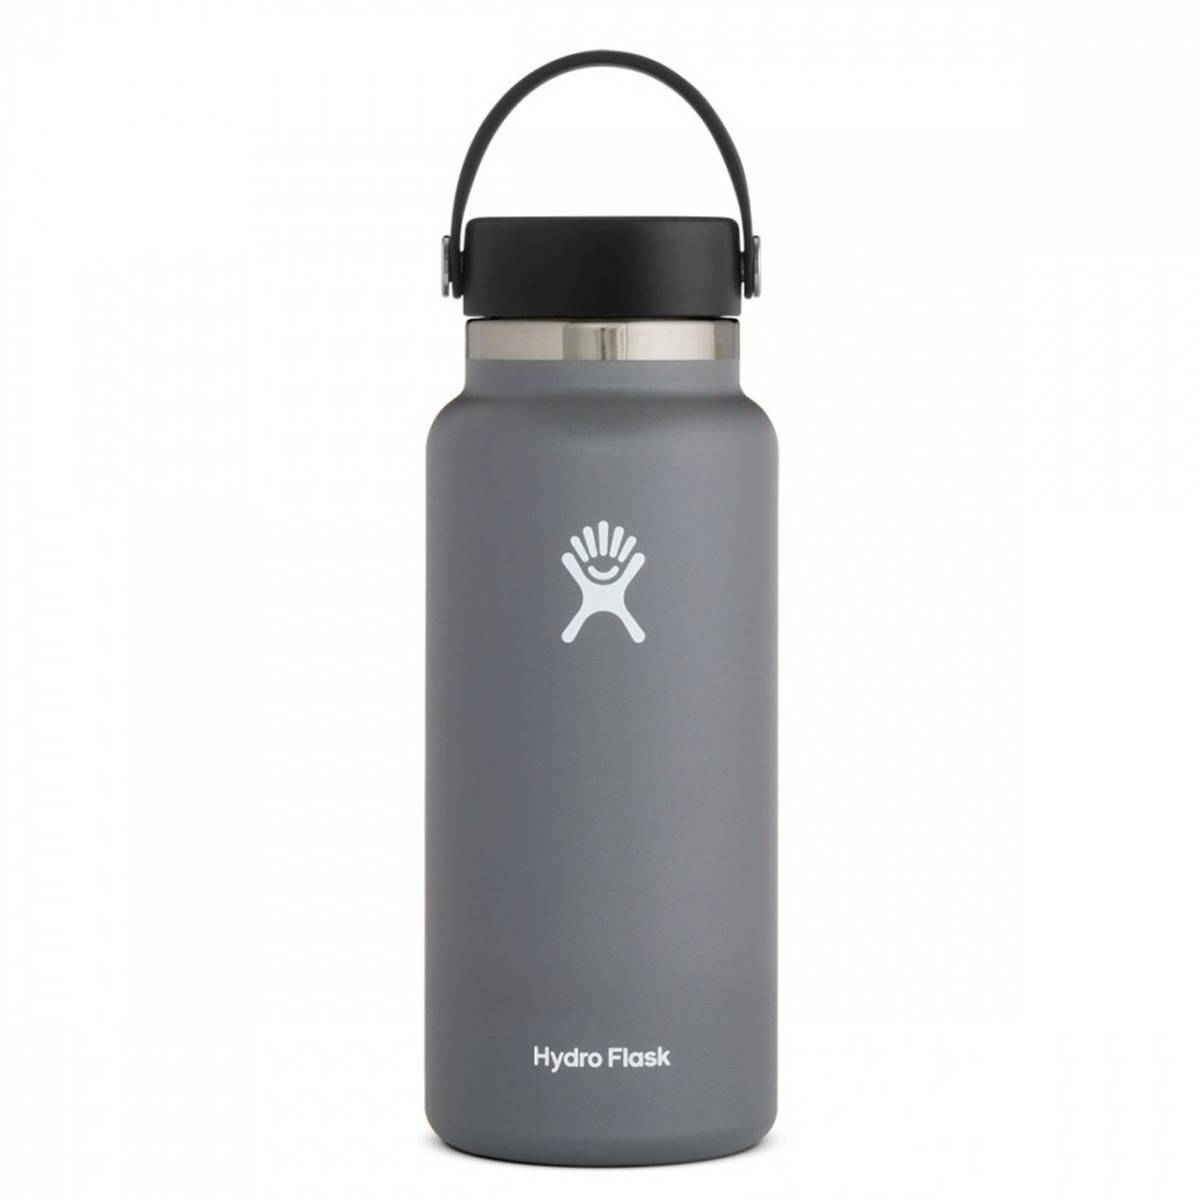 Termoflaske 946 ml, STONE,Wide Mouth Flex Cap / Hydro Flask